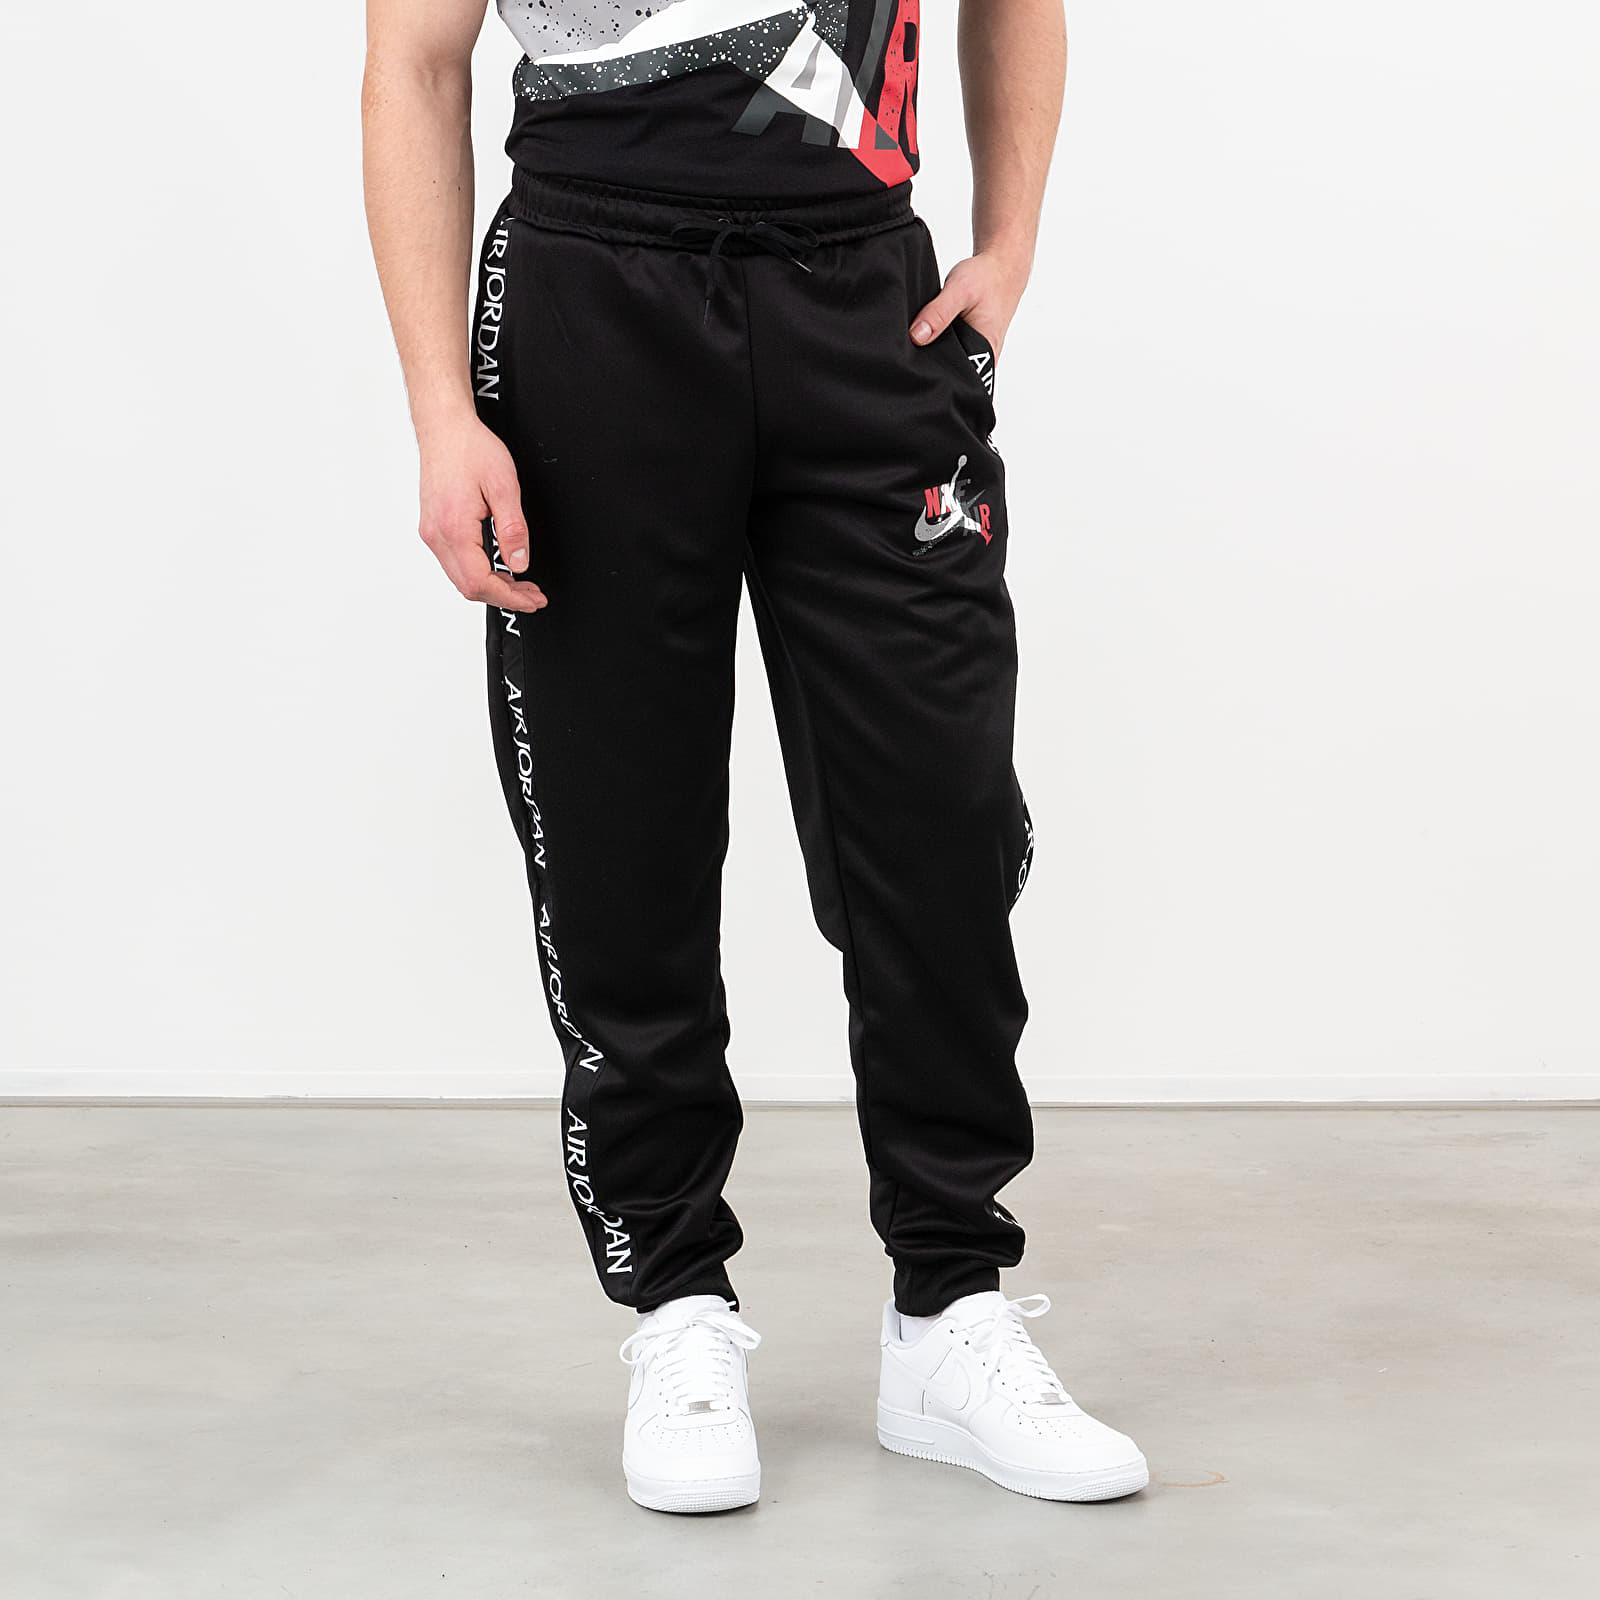 Jordan Classics Tricot Warmup Pants